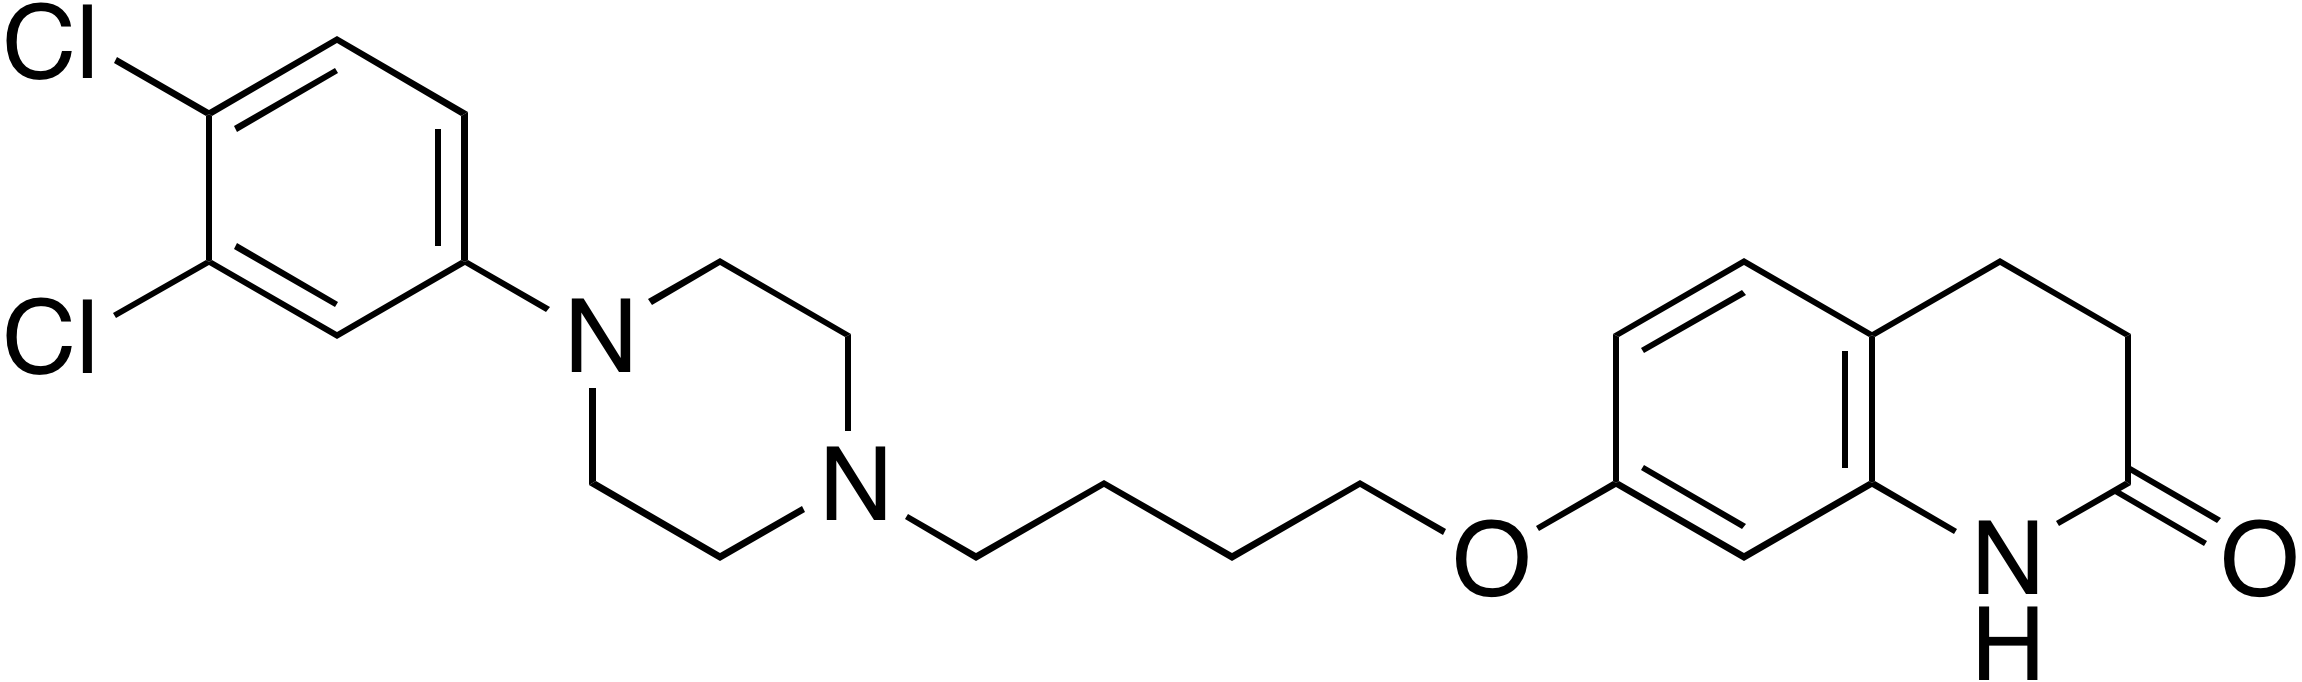 Aripiprazole 3,4-dichloro impurity